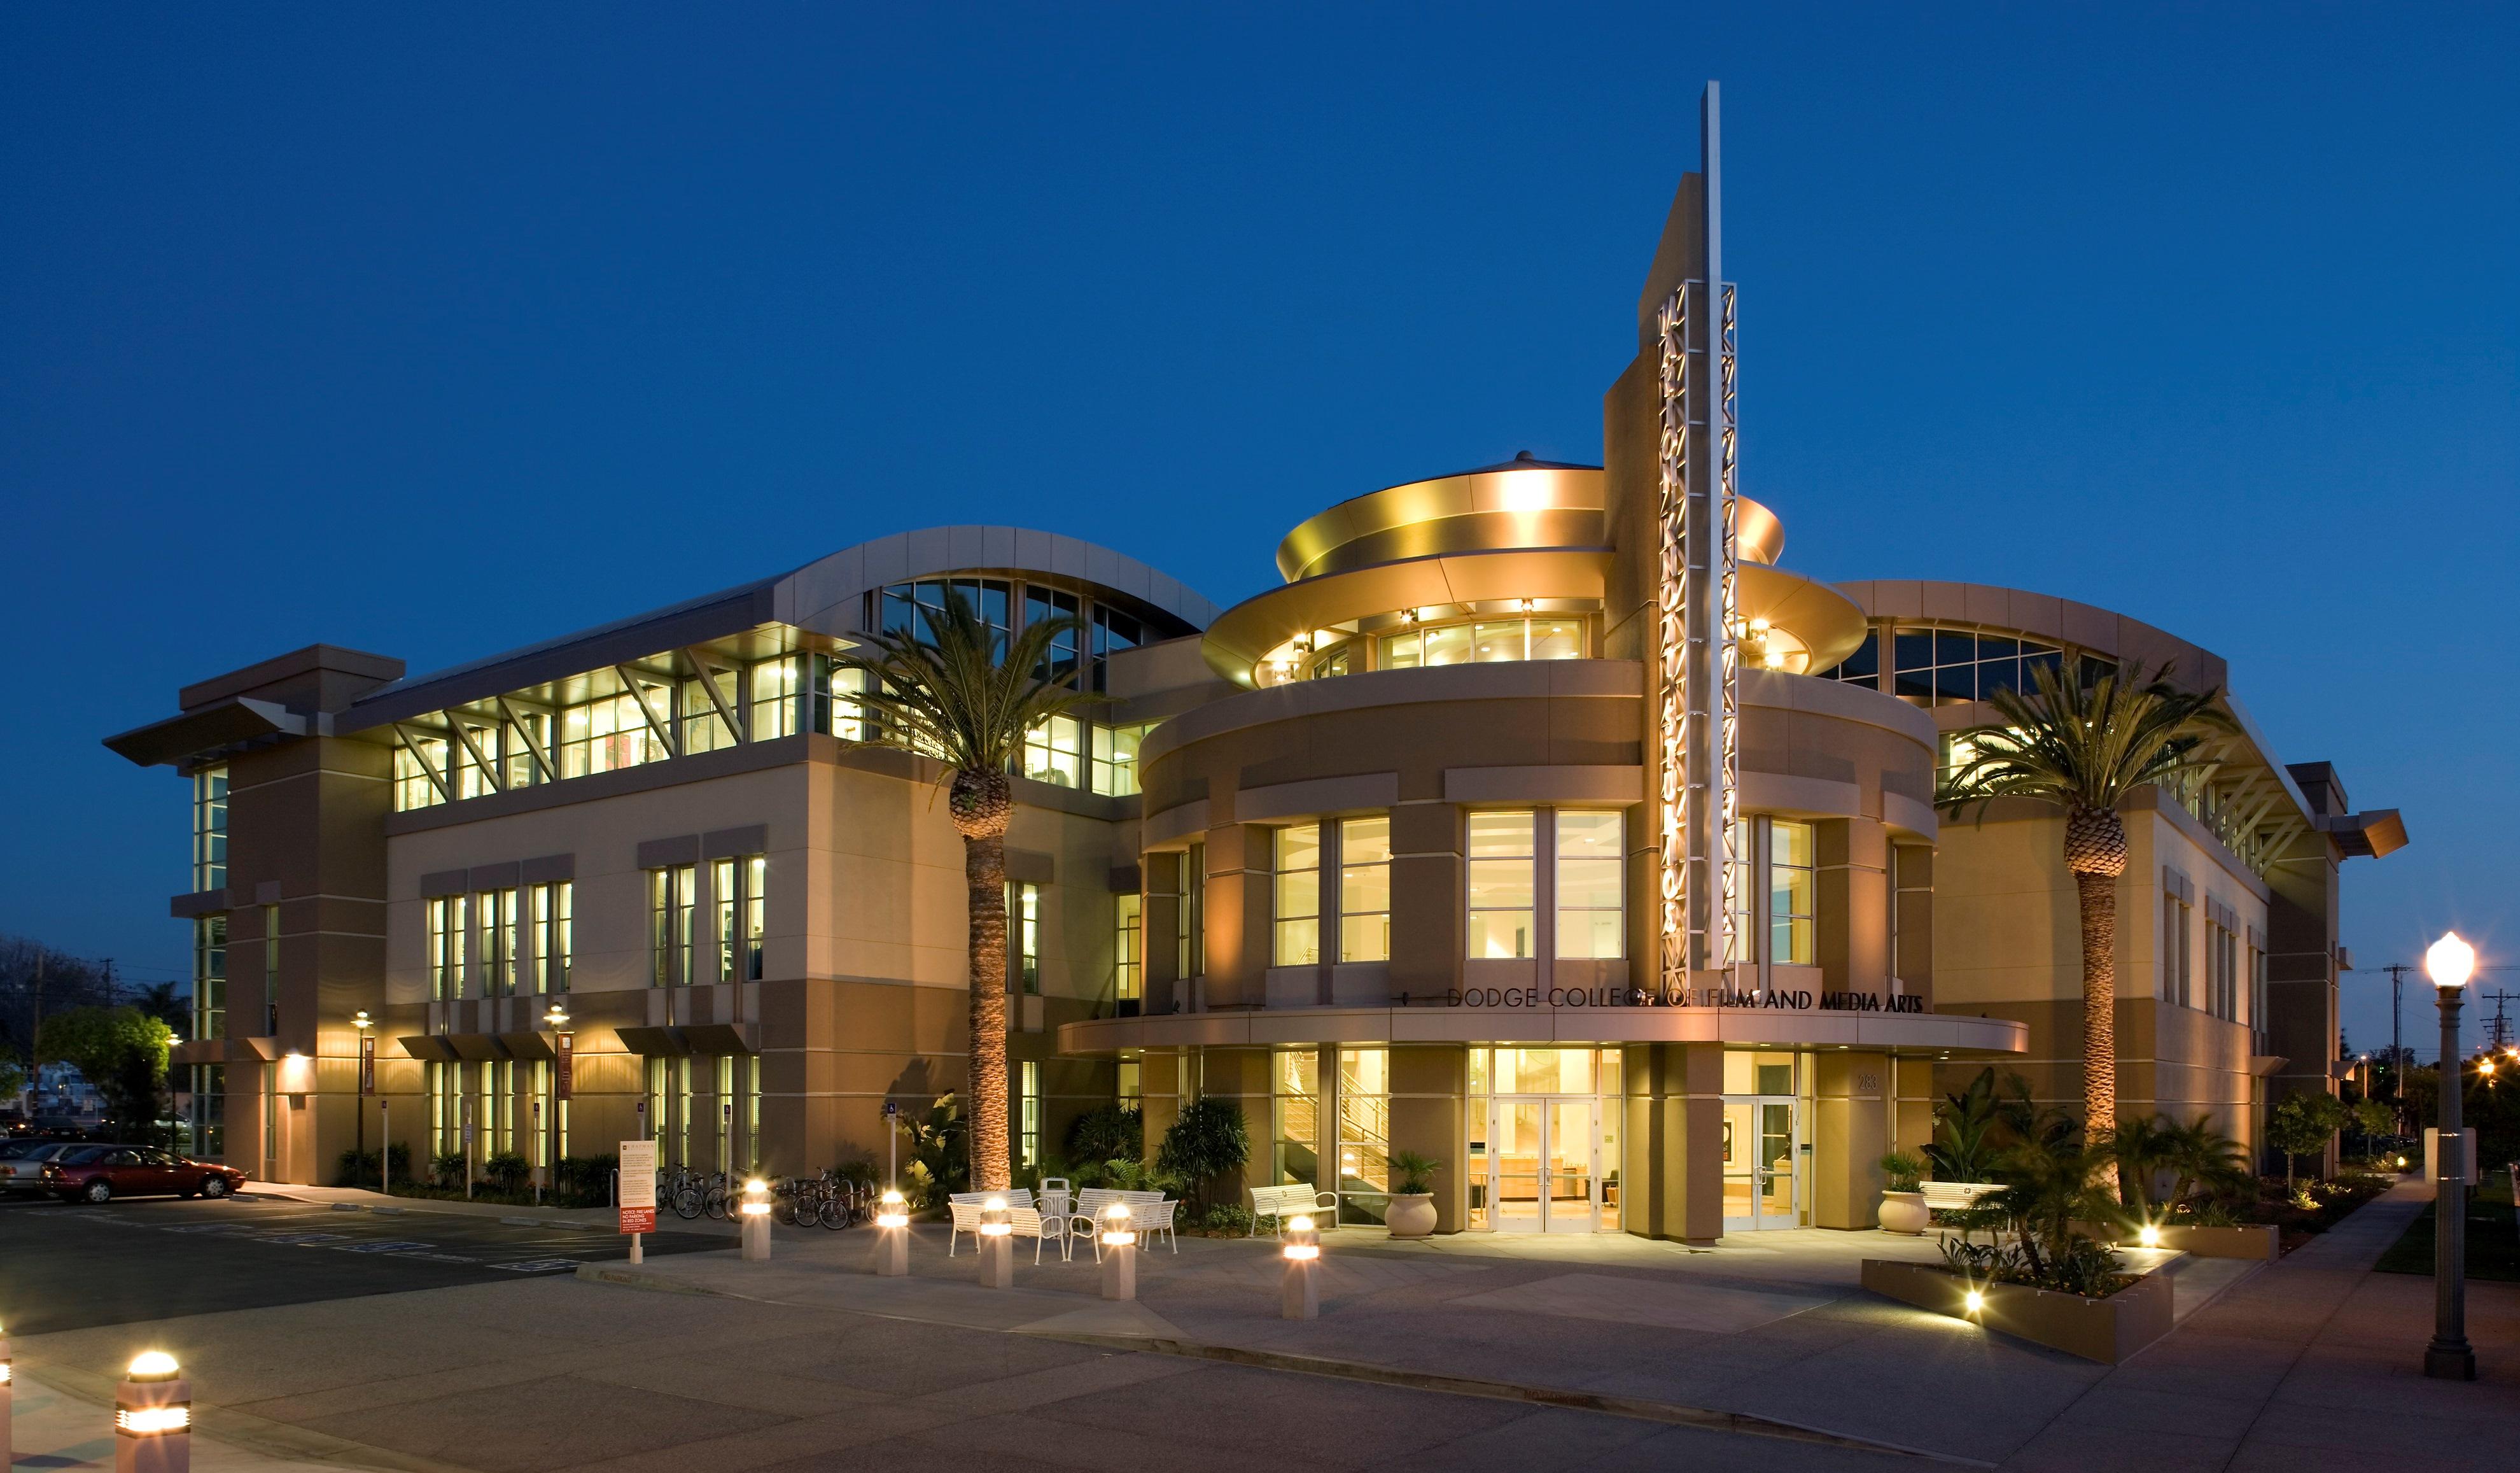 Marion Knott Studios, Dodge College, at night